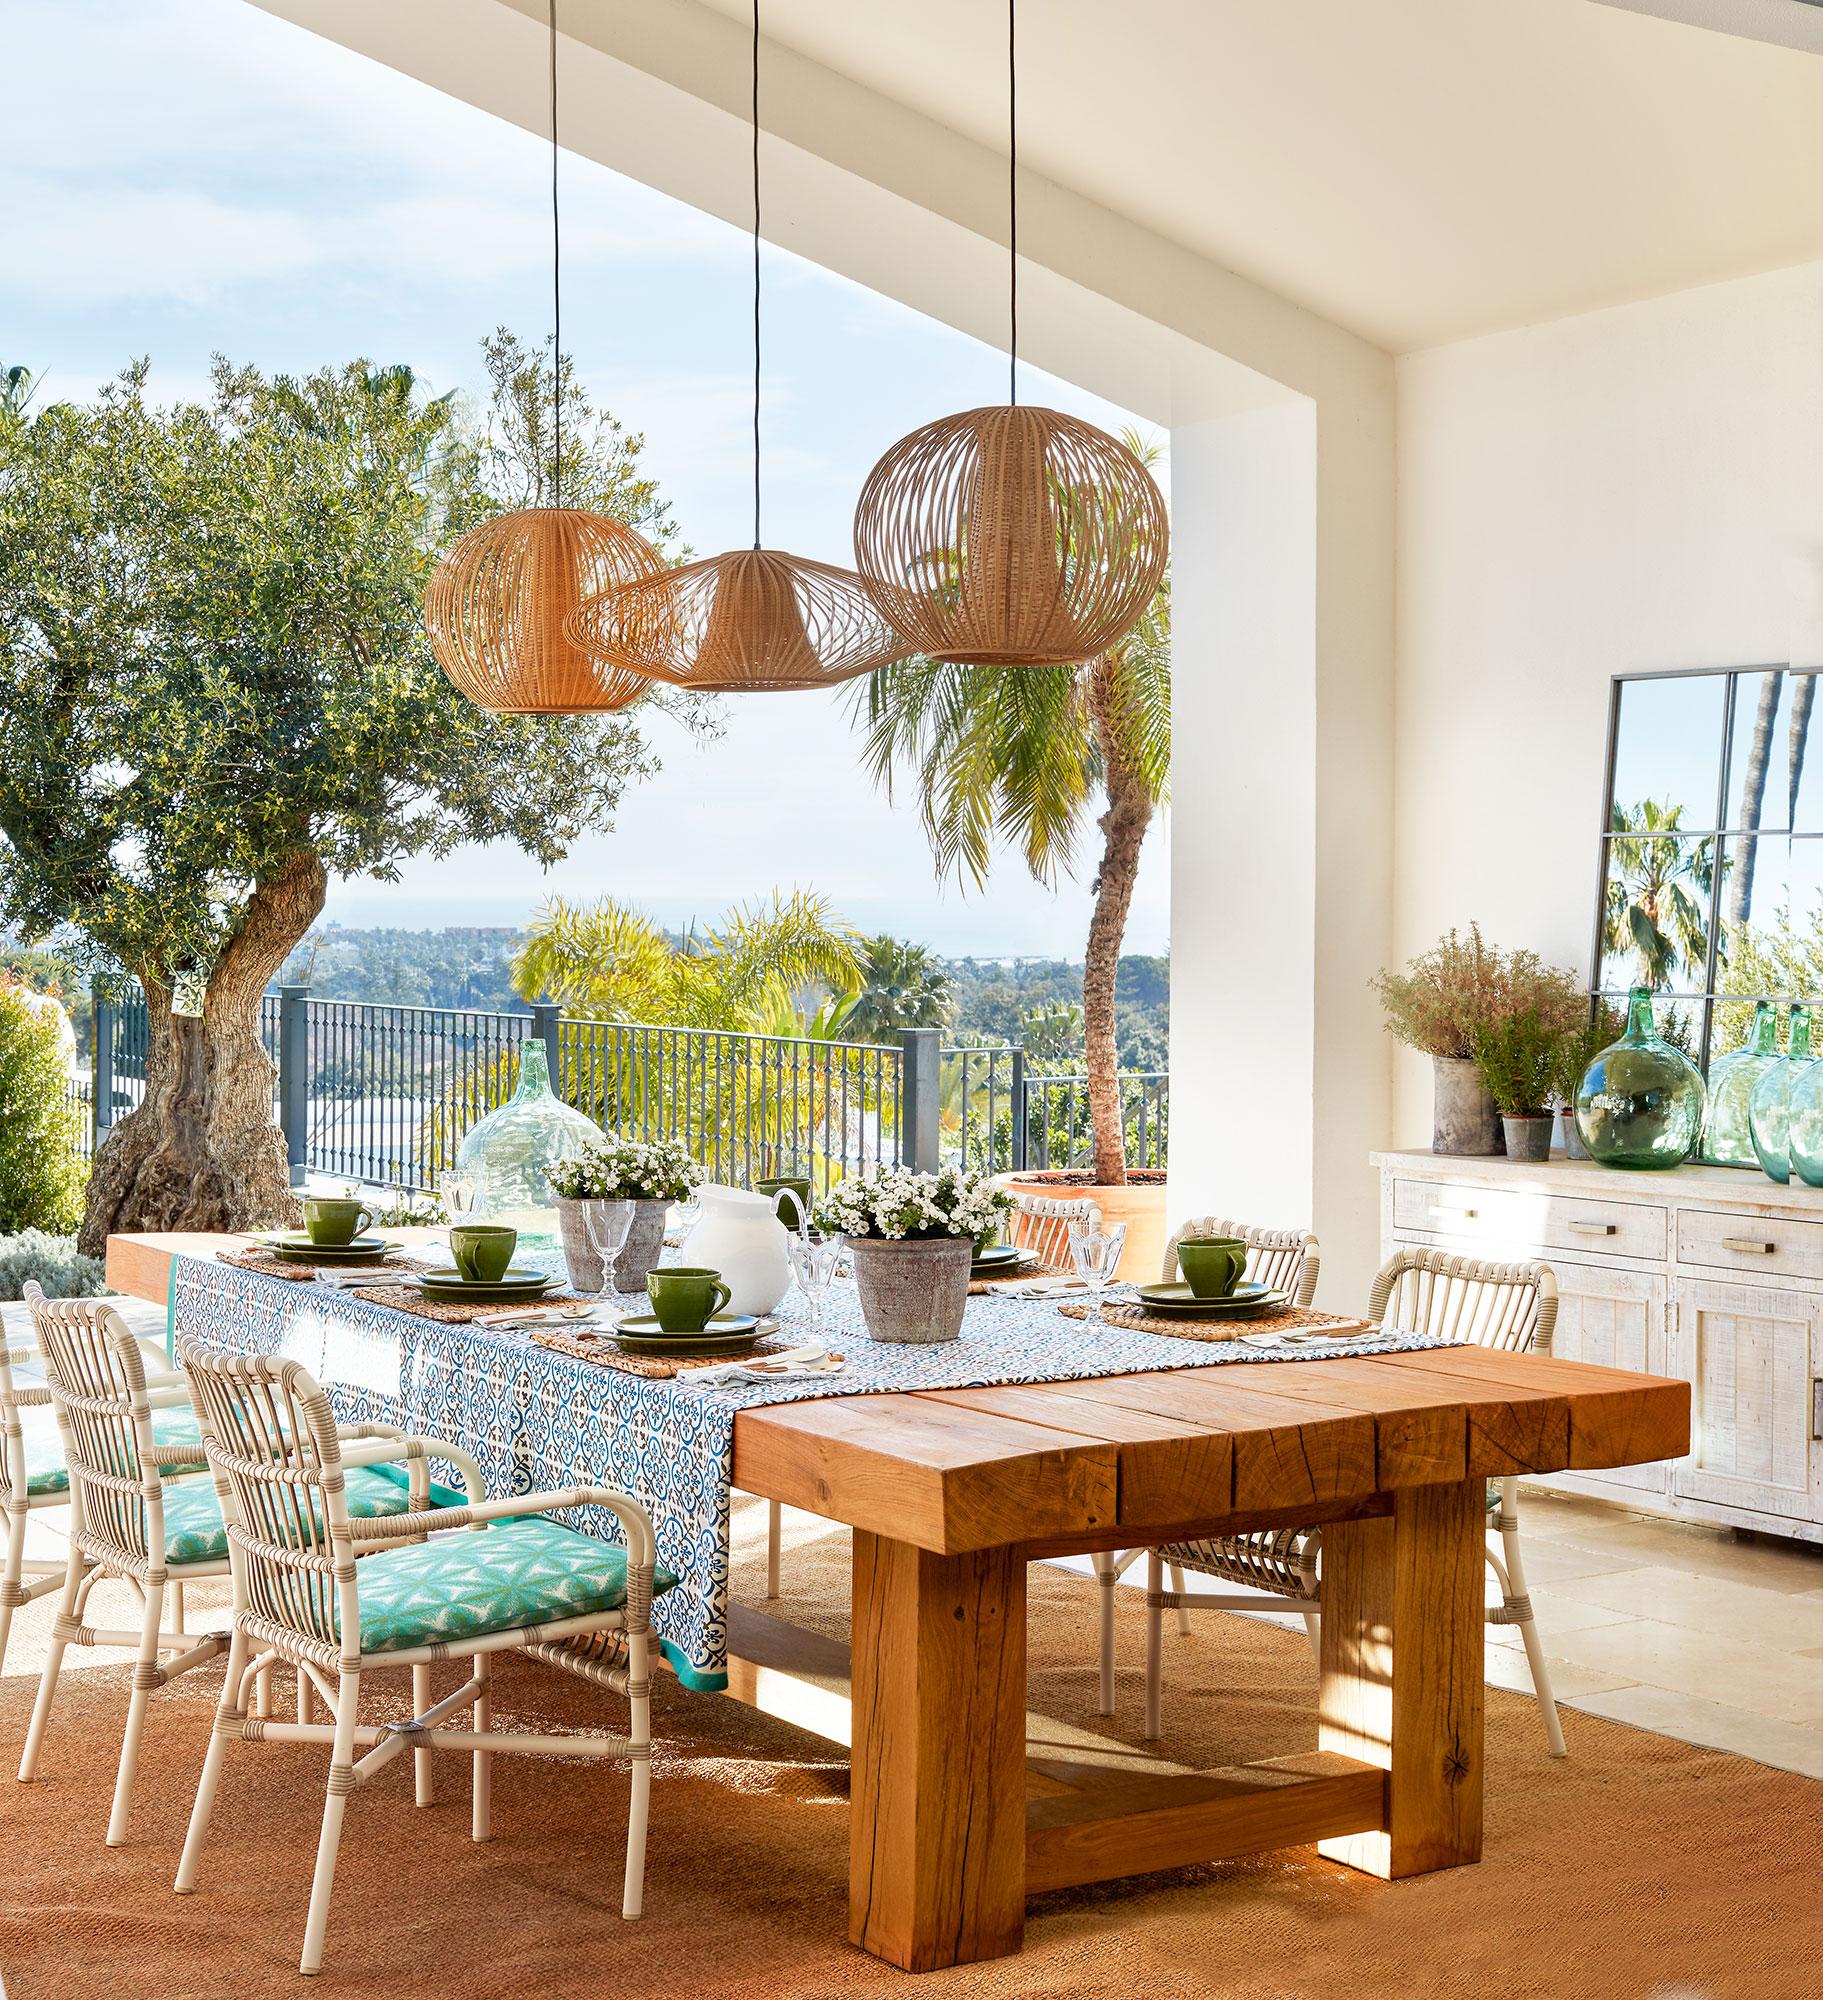 Mesas de comedor c mo elegir tu mesa de comedor perfecta - Sillas de forja para comedor ...